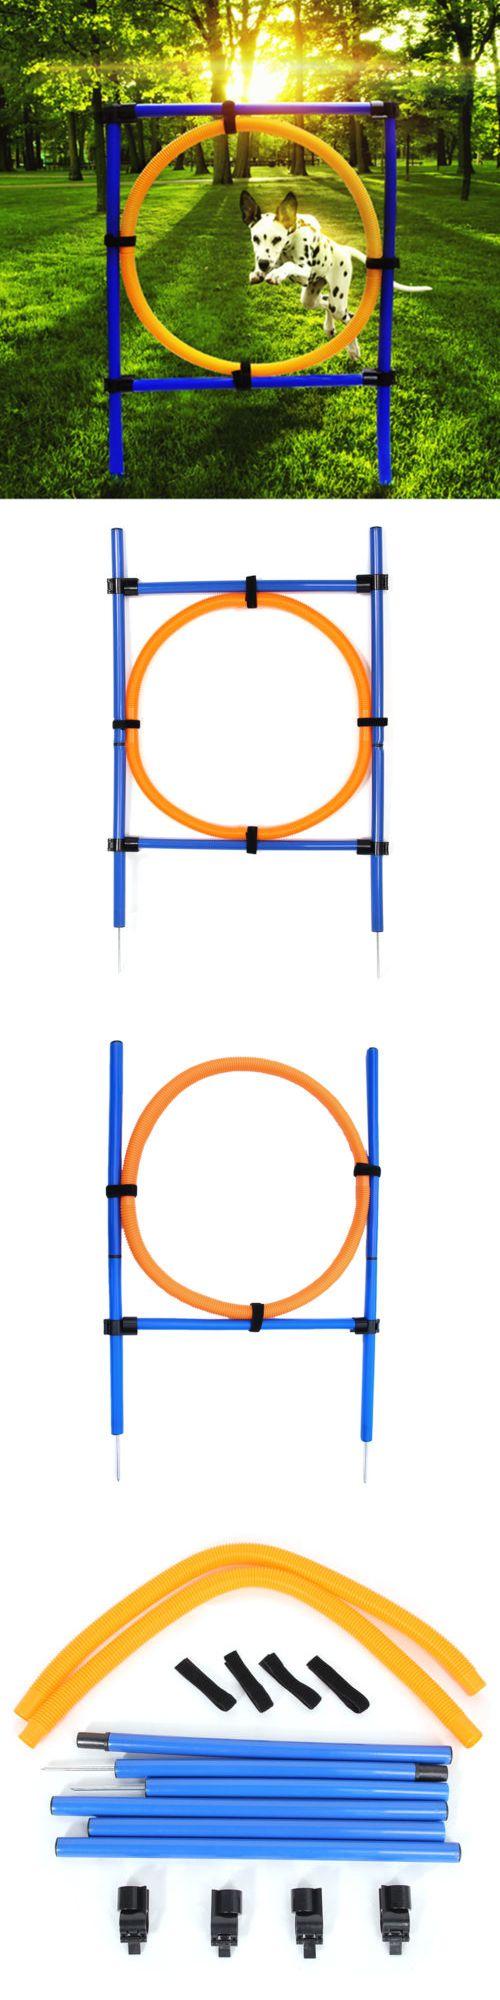 Agility Training 116383: Pet Dog Agility Training,Jump Hoop,Jump Bar,Dog Agility Starter Equipment -> BUY IT NOW ONLY: $38.49 on eBay!